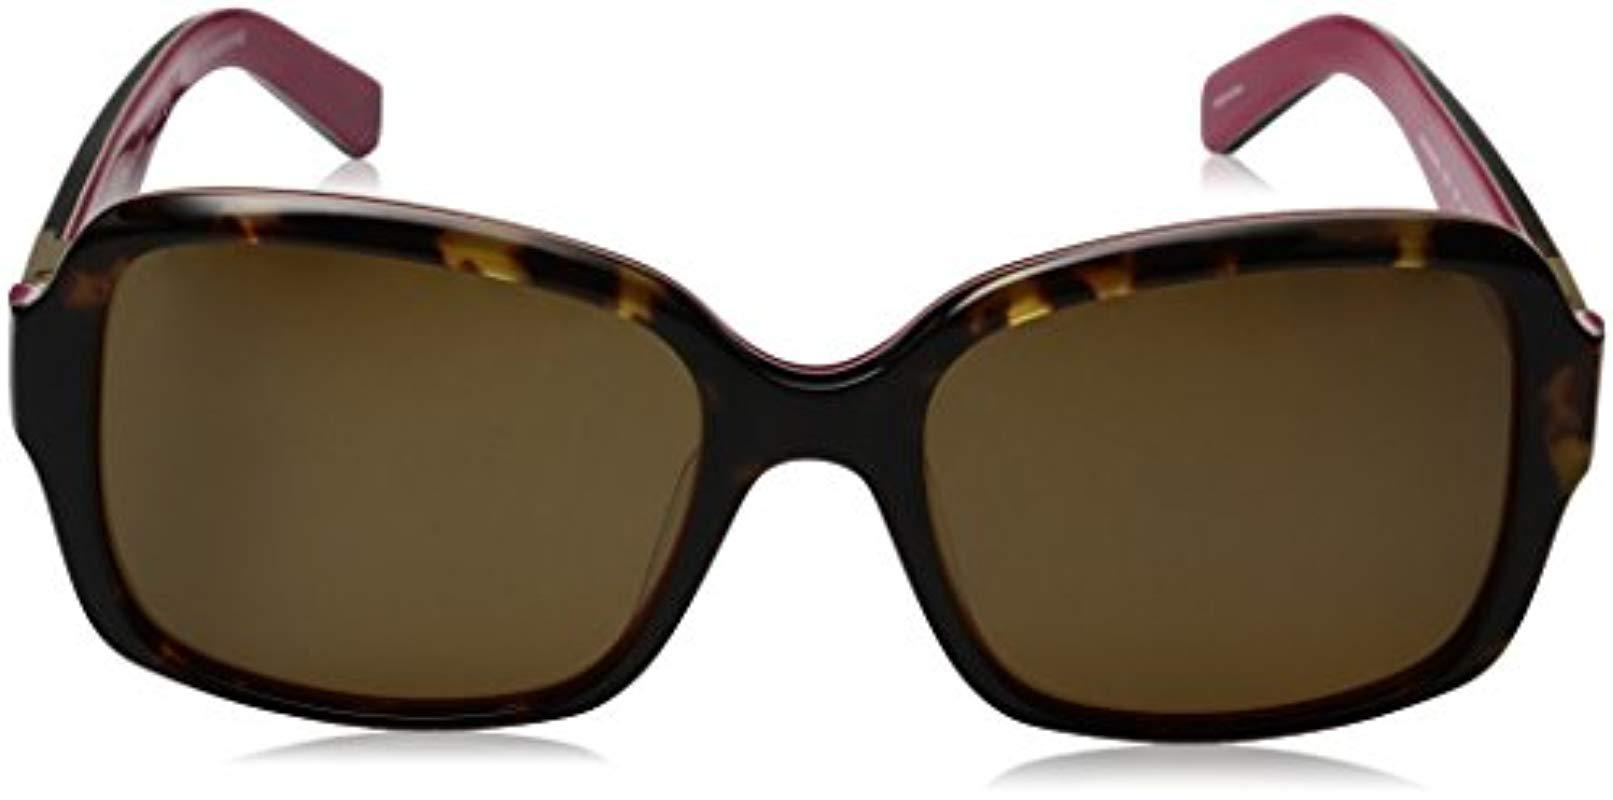 b08f1293d4 ... Brown Kate Spade Annora ps Annorps Polarized Rectangular Sunglasses -  Lyst. View fullscreen